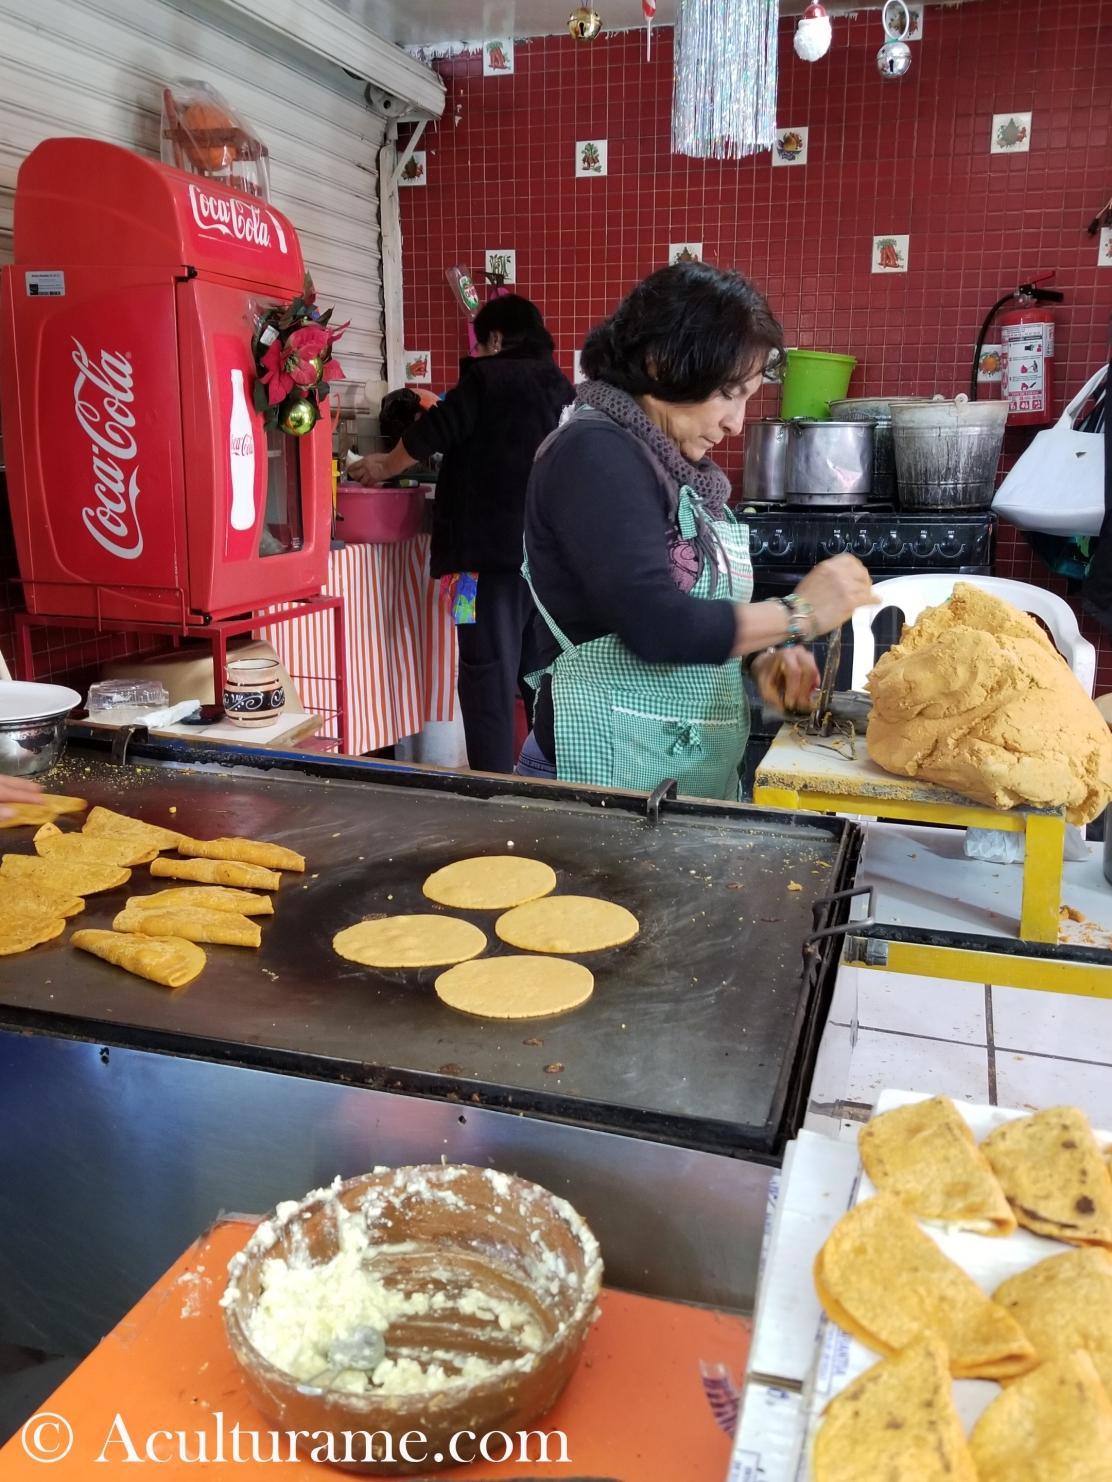 A woman preparing traditional enchiladas potosinas from scratch.